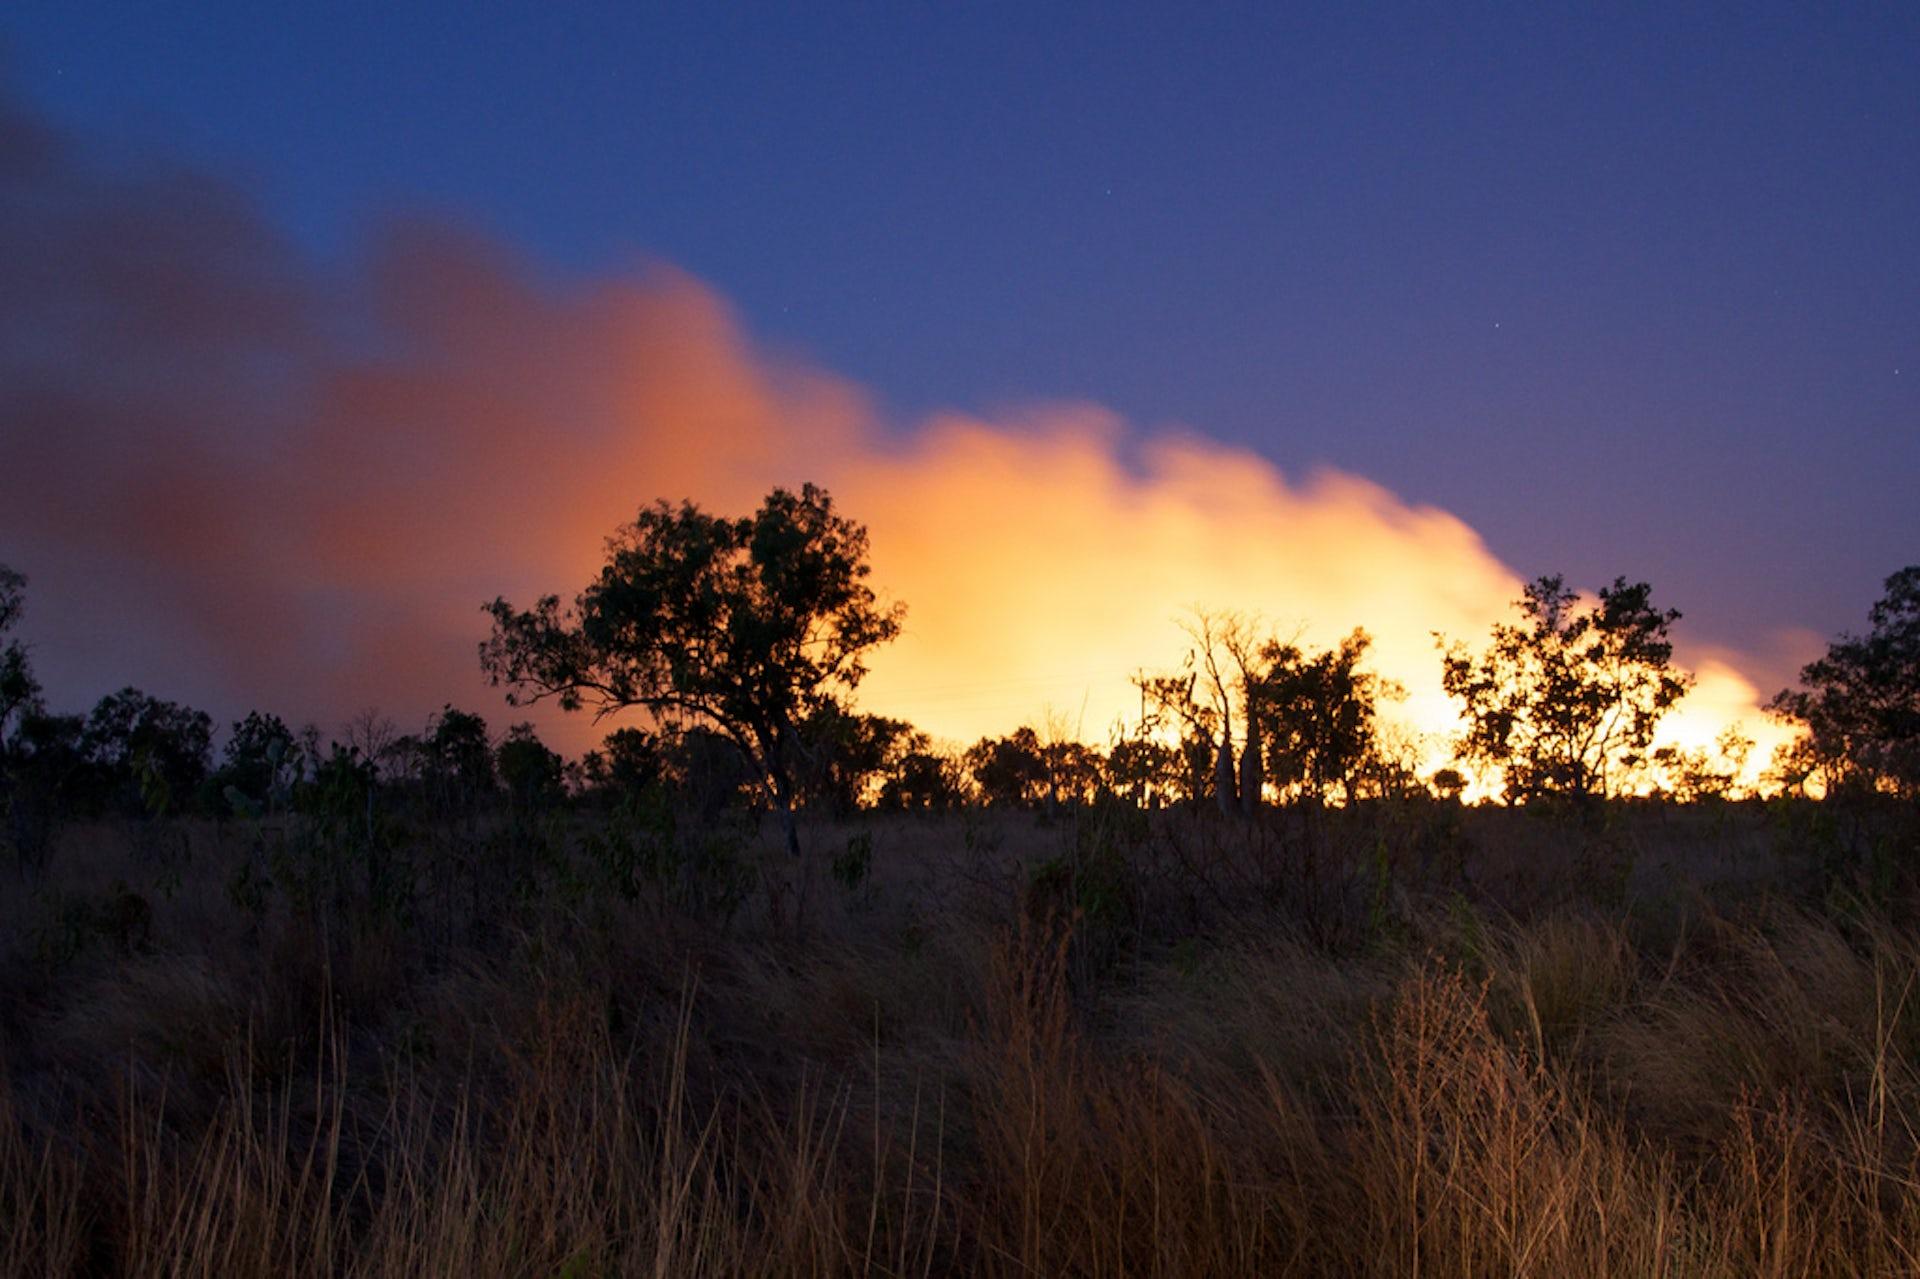 aboriginal health impact statement and guidelines western australia